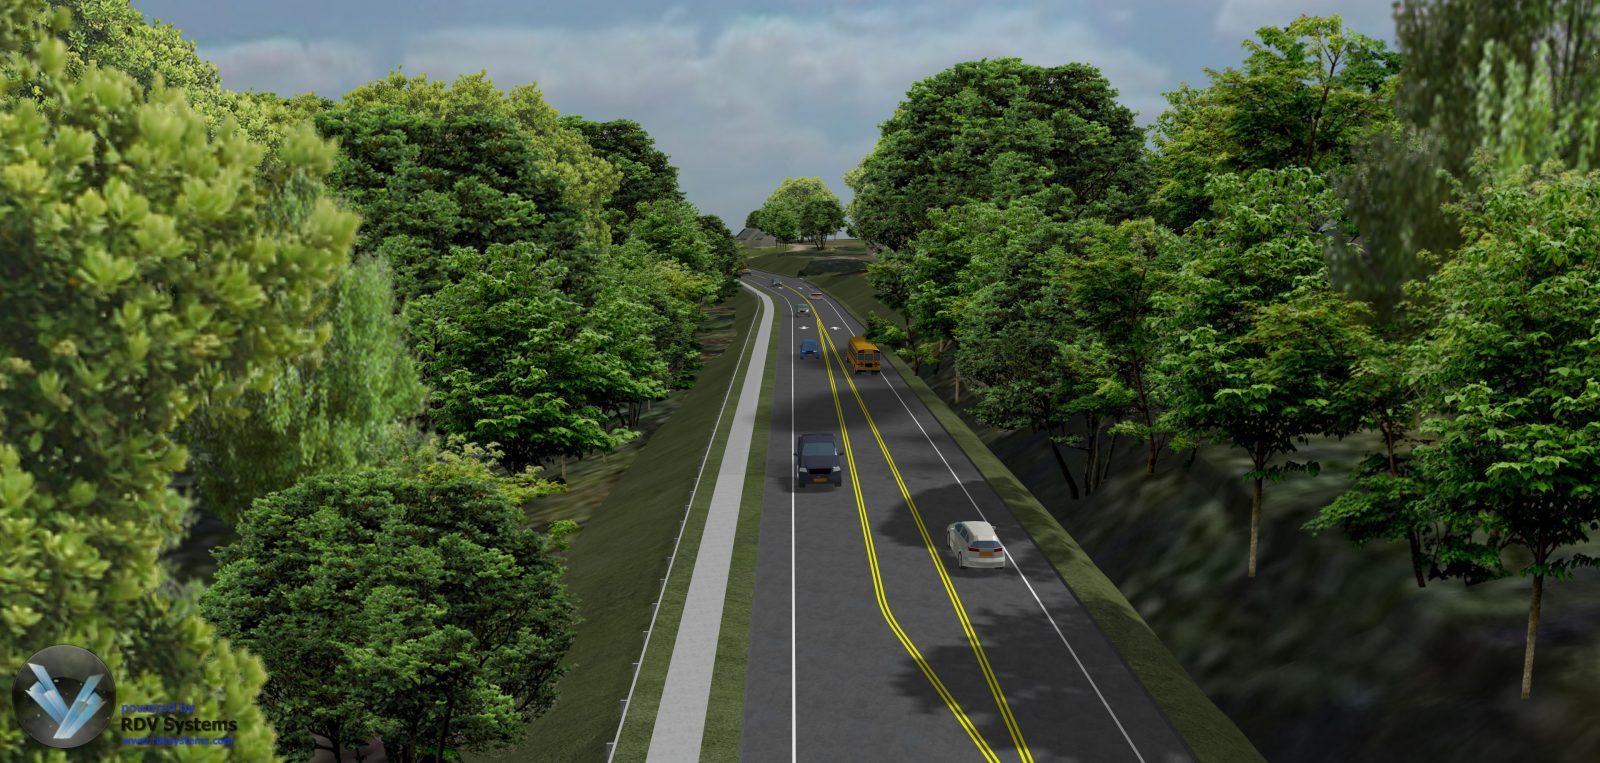 RDV Systems - Danbury Route 37 2